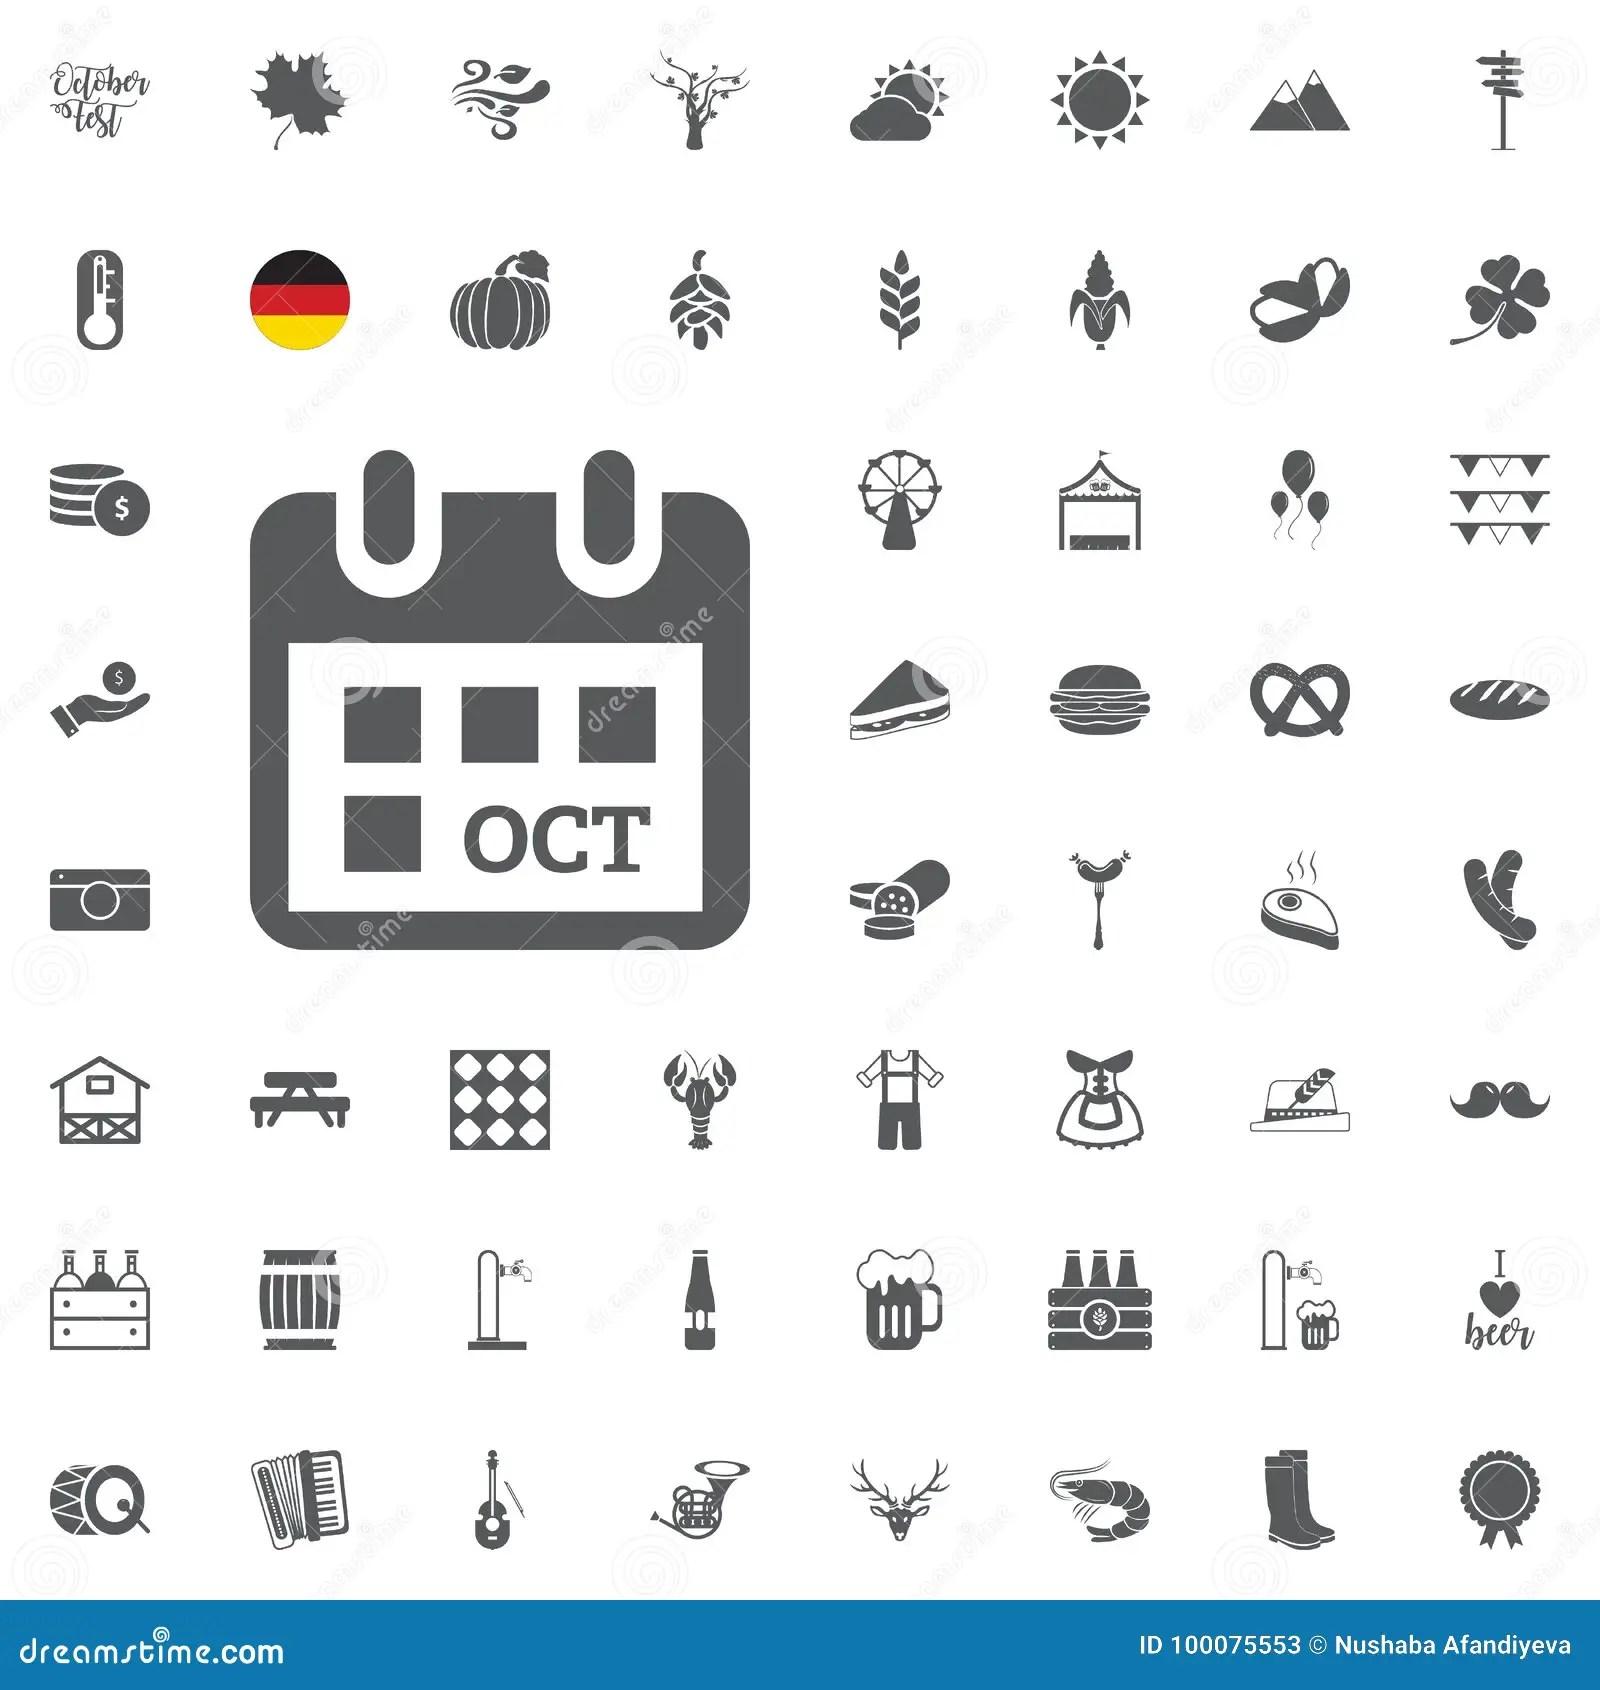 german festival october | wiring diagram database on german wire  symbols, circuit diagram symbols,